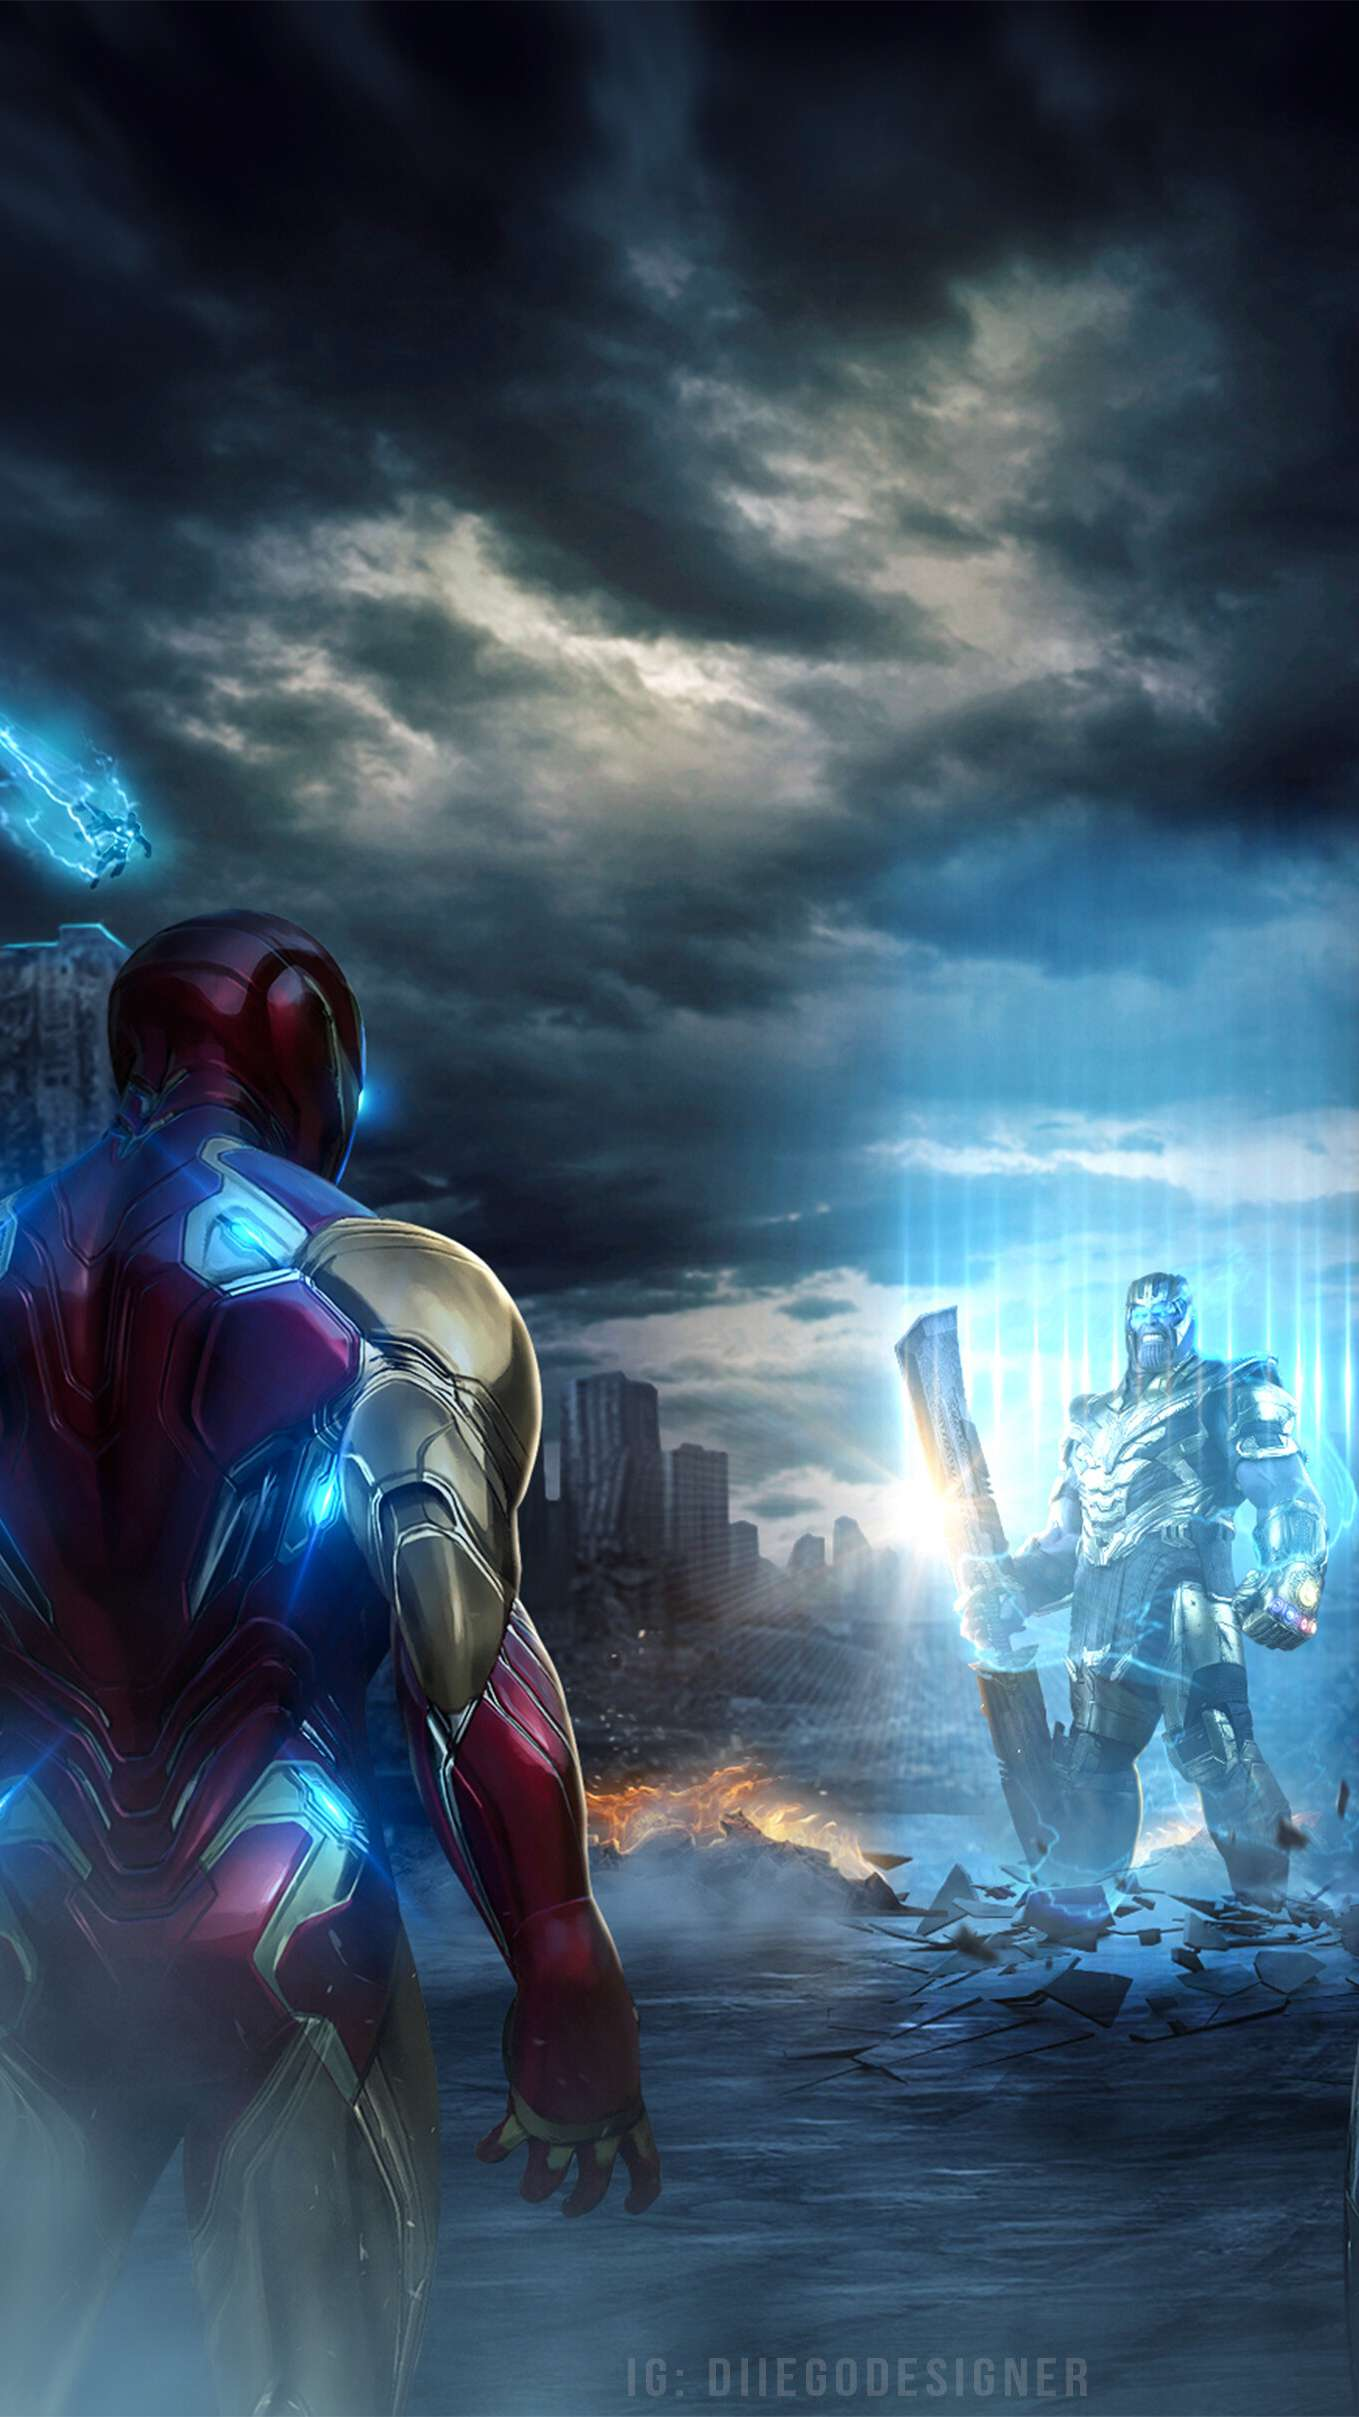 Thanos vs Ironman Endgame iPhone Wallpaper